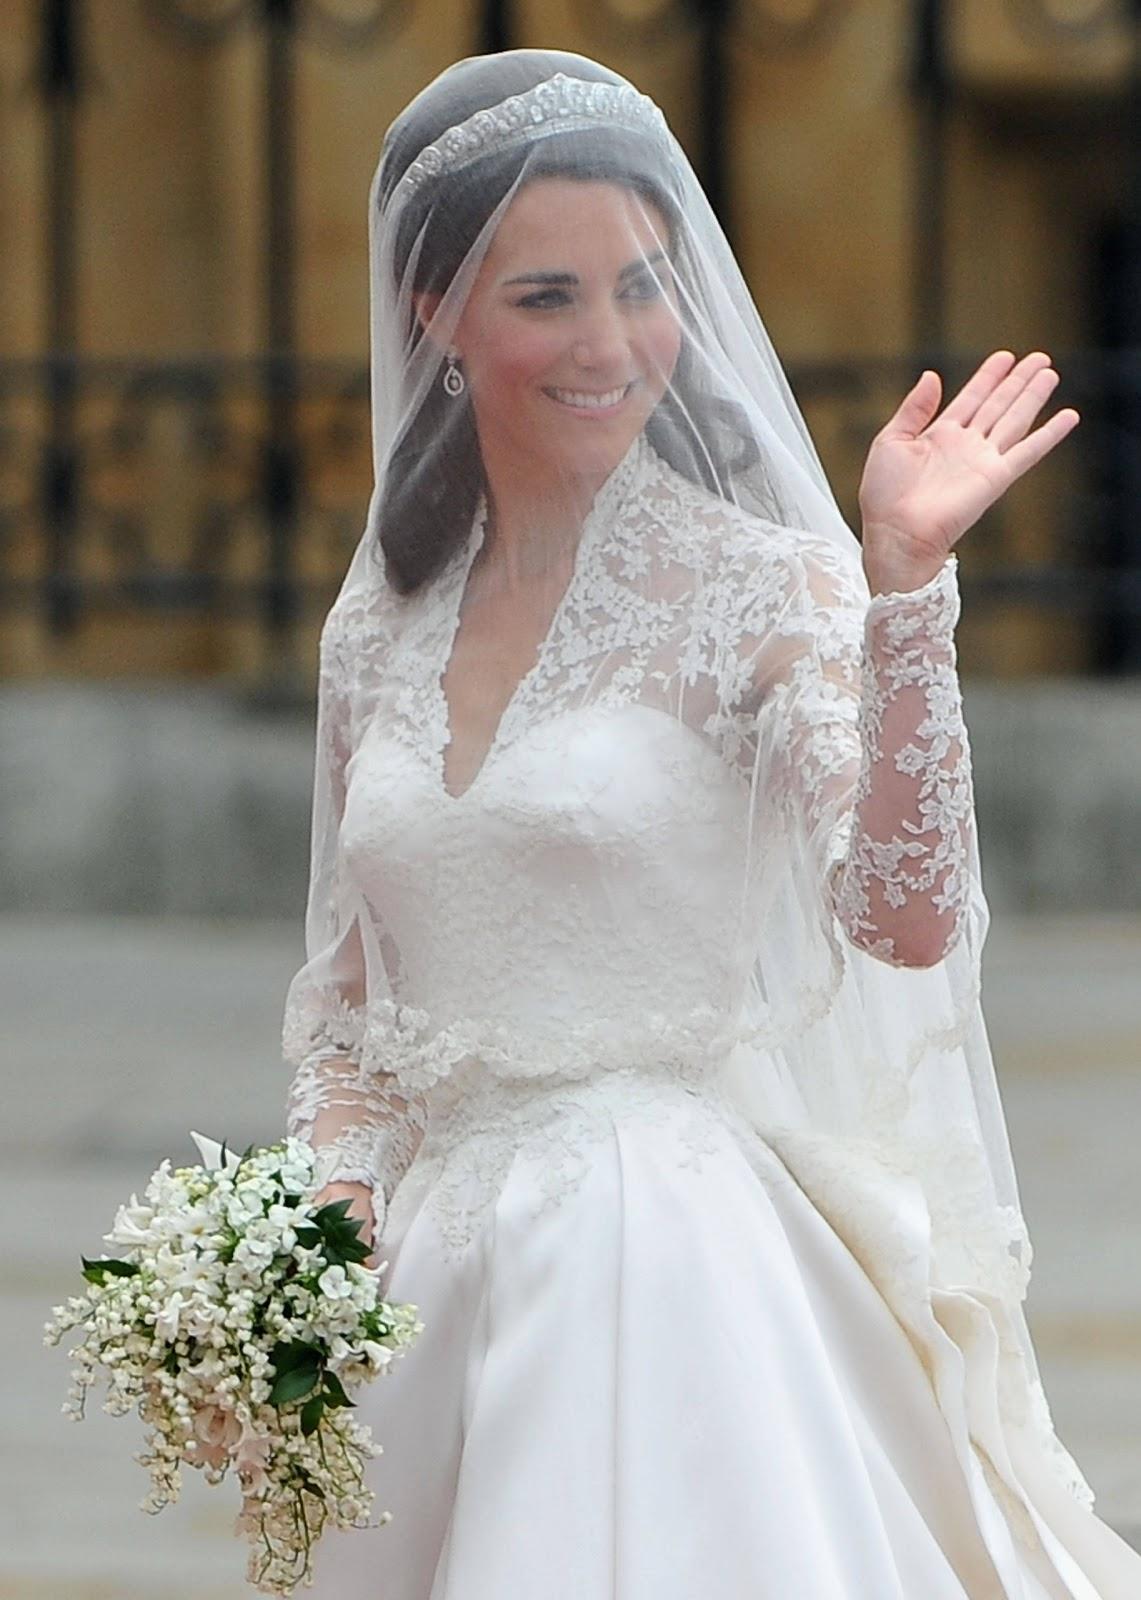 Still Kate Middleton for a little while longer title=